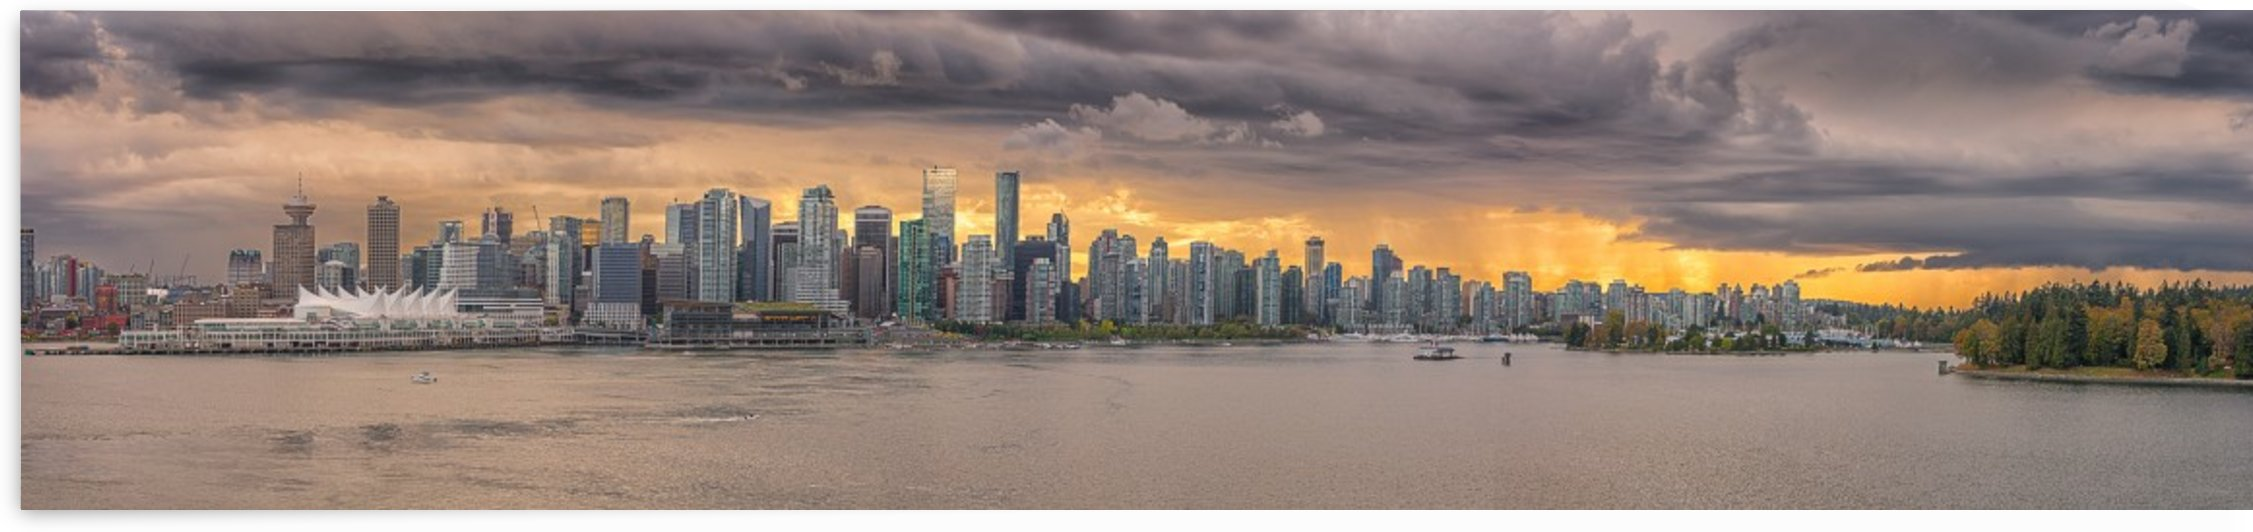 Vancouver by Andrea Spallanzani